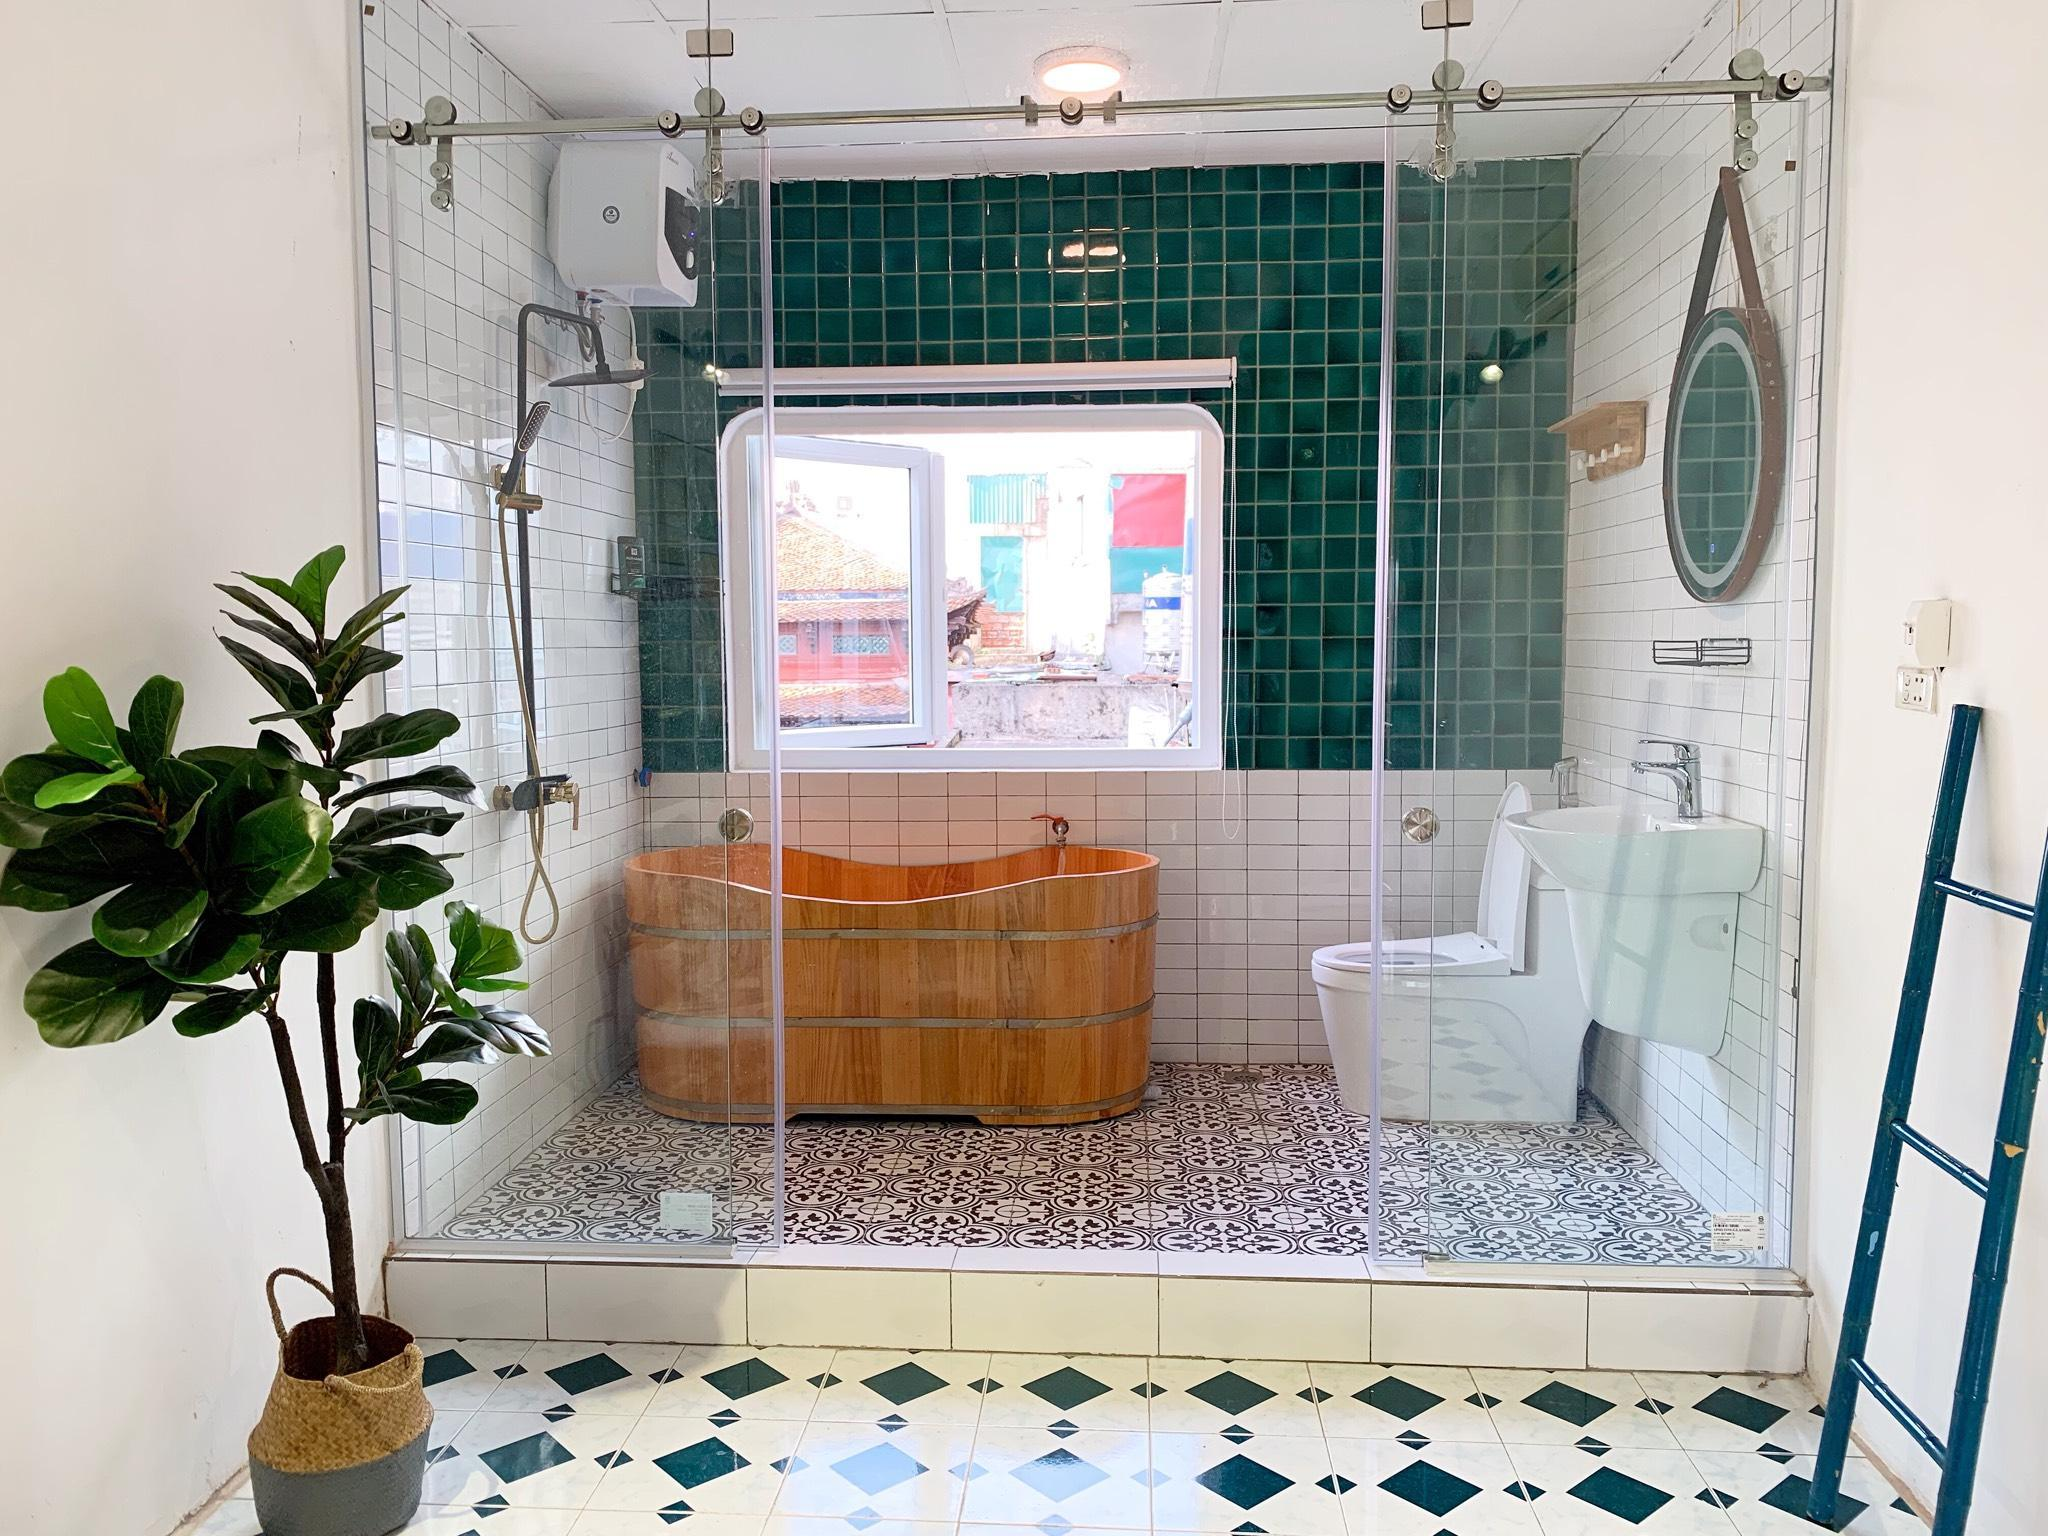 OPEN SPACE Fully SUNLIGHT BALCONYand BATHTUB Kitchen